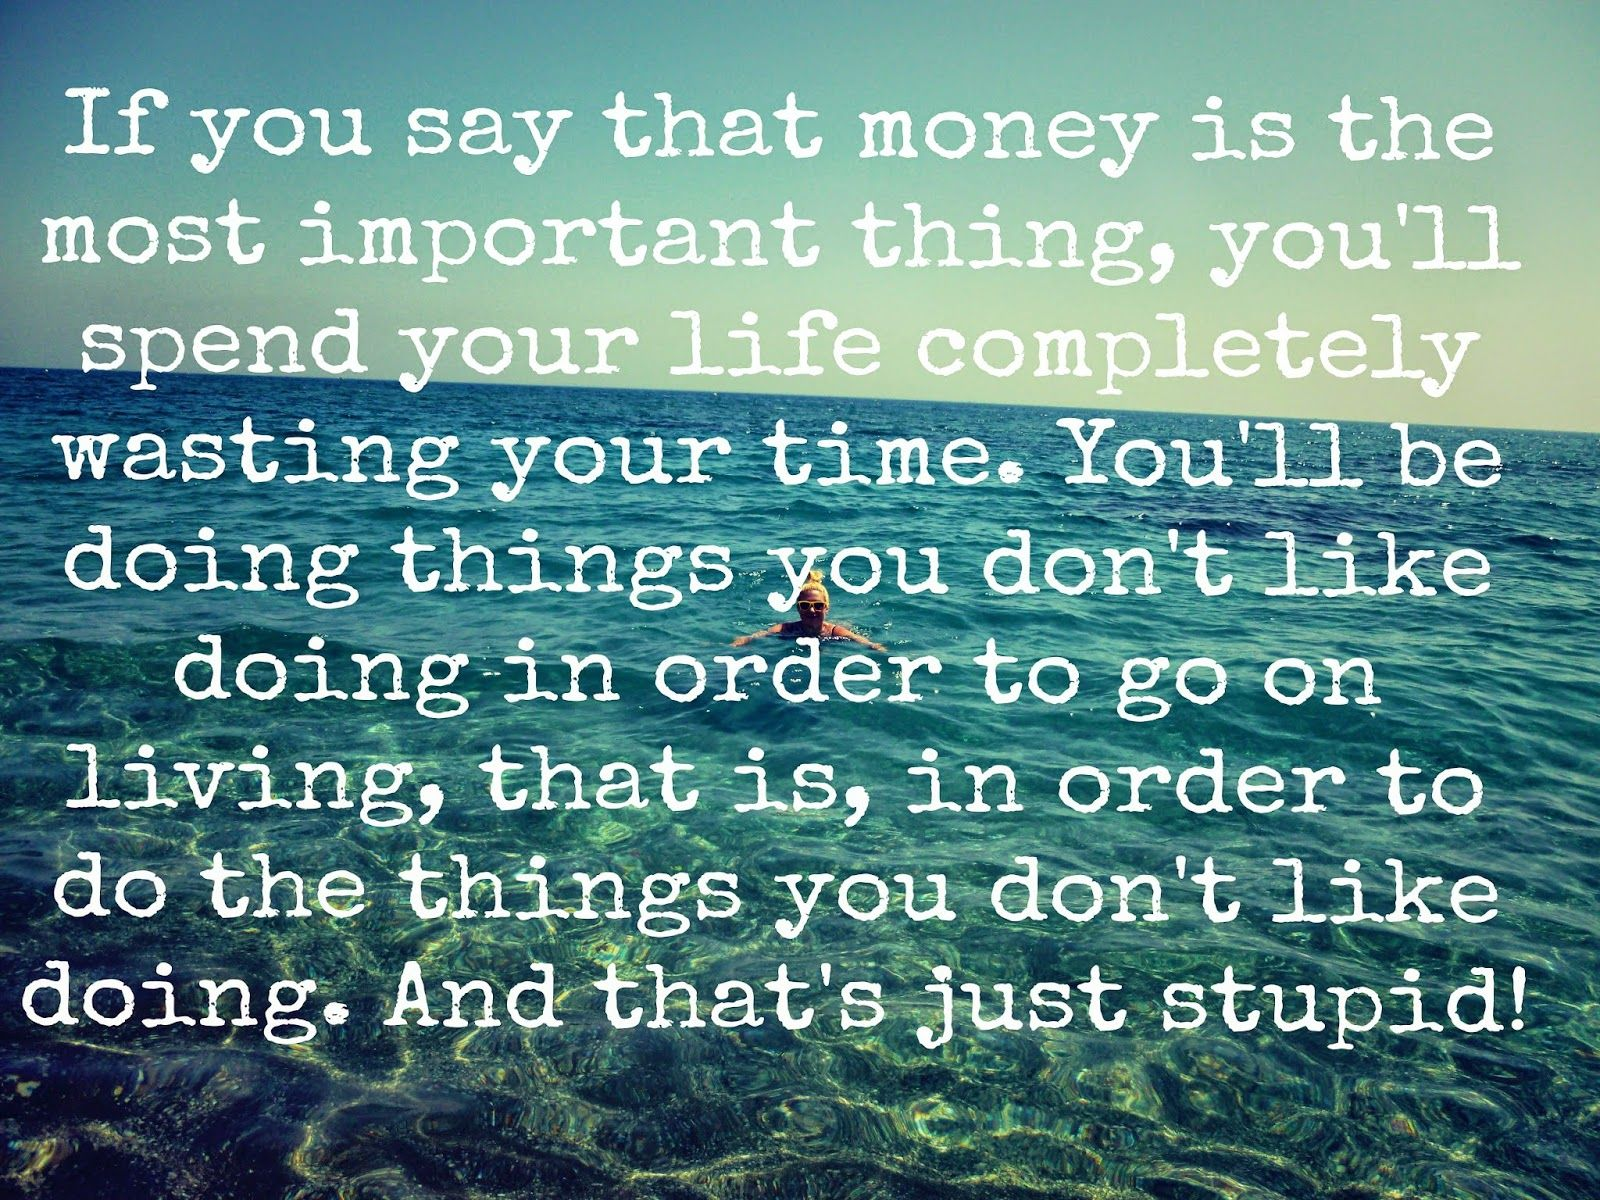 Inspirational Quotes | Positive Tidbits | Pinterest | Alan watts ...